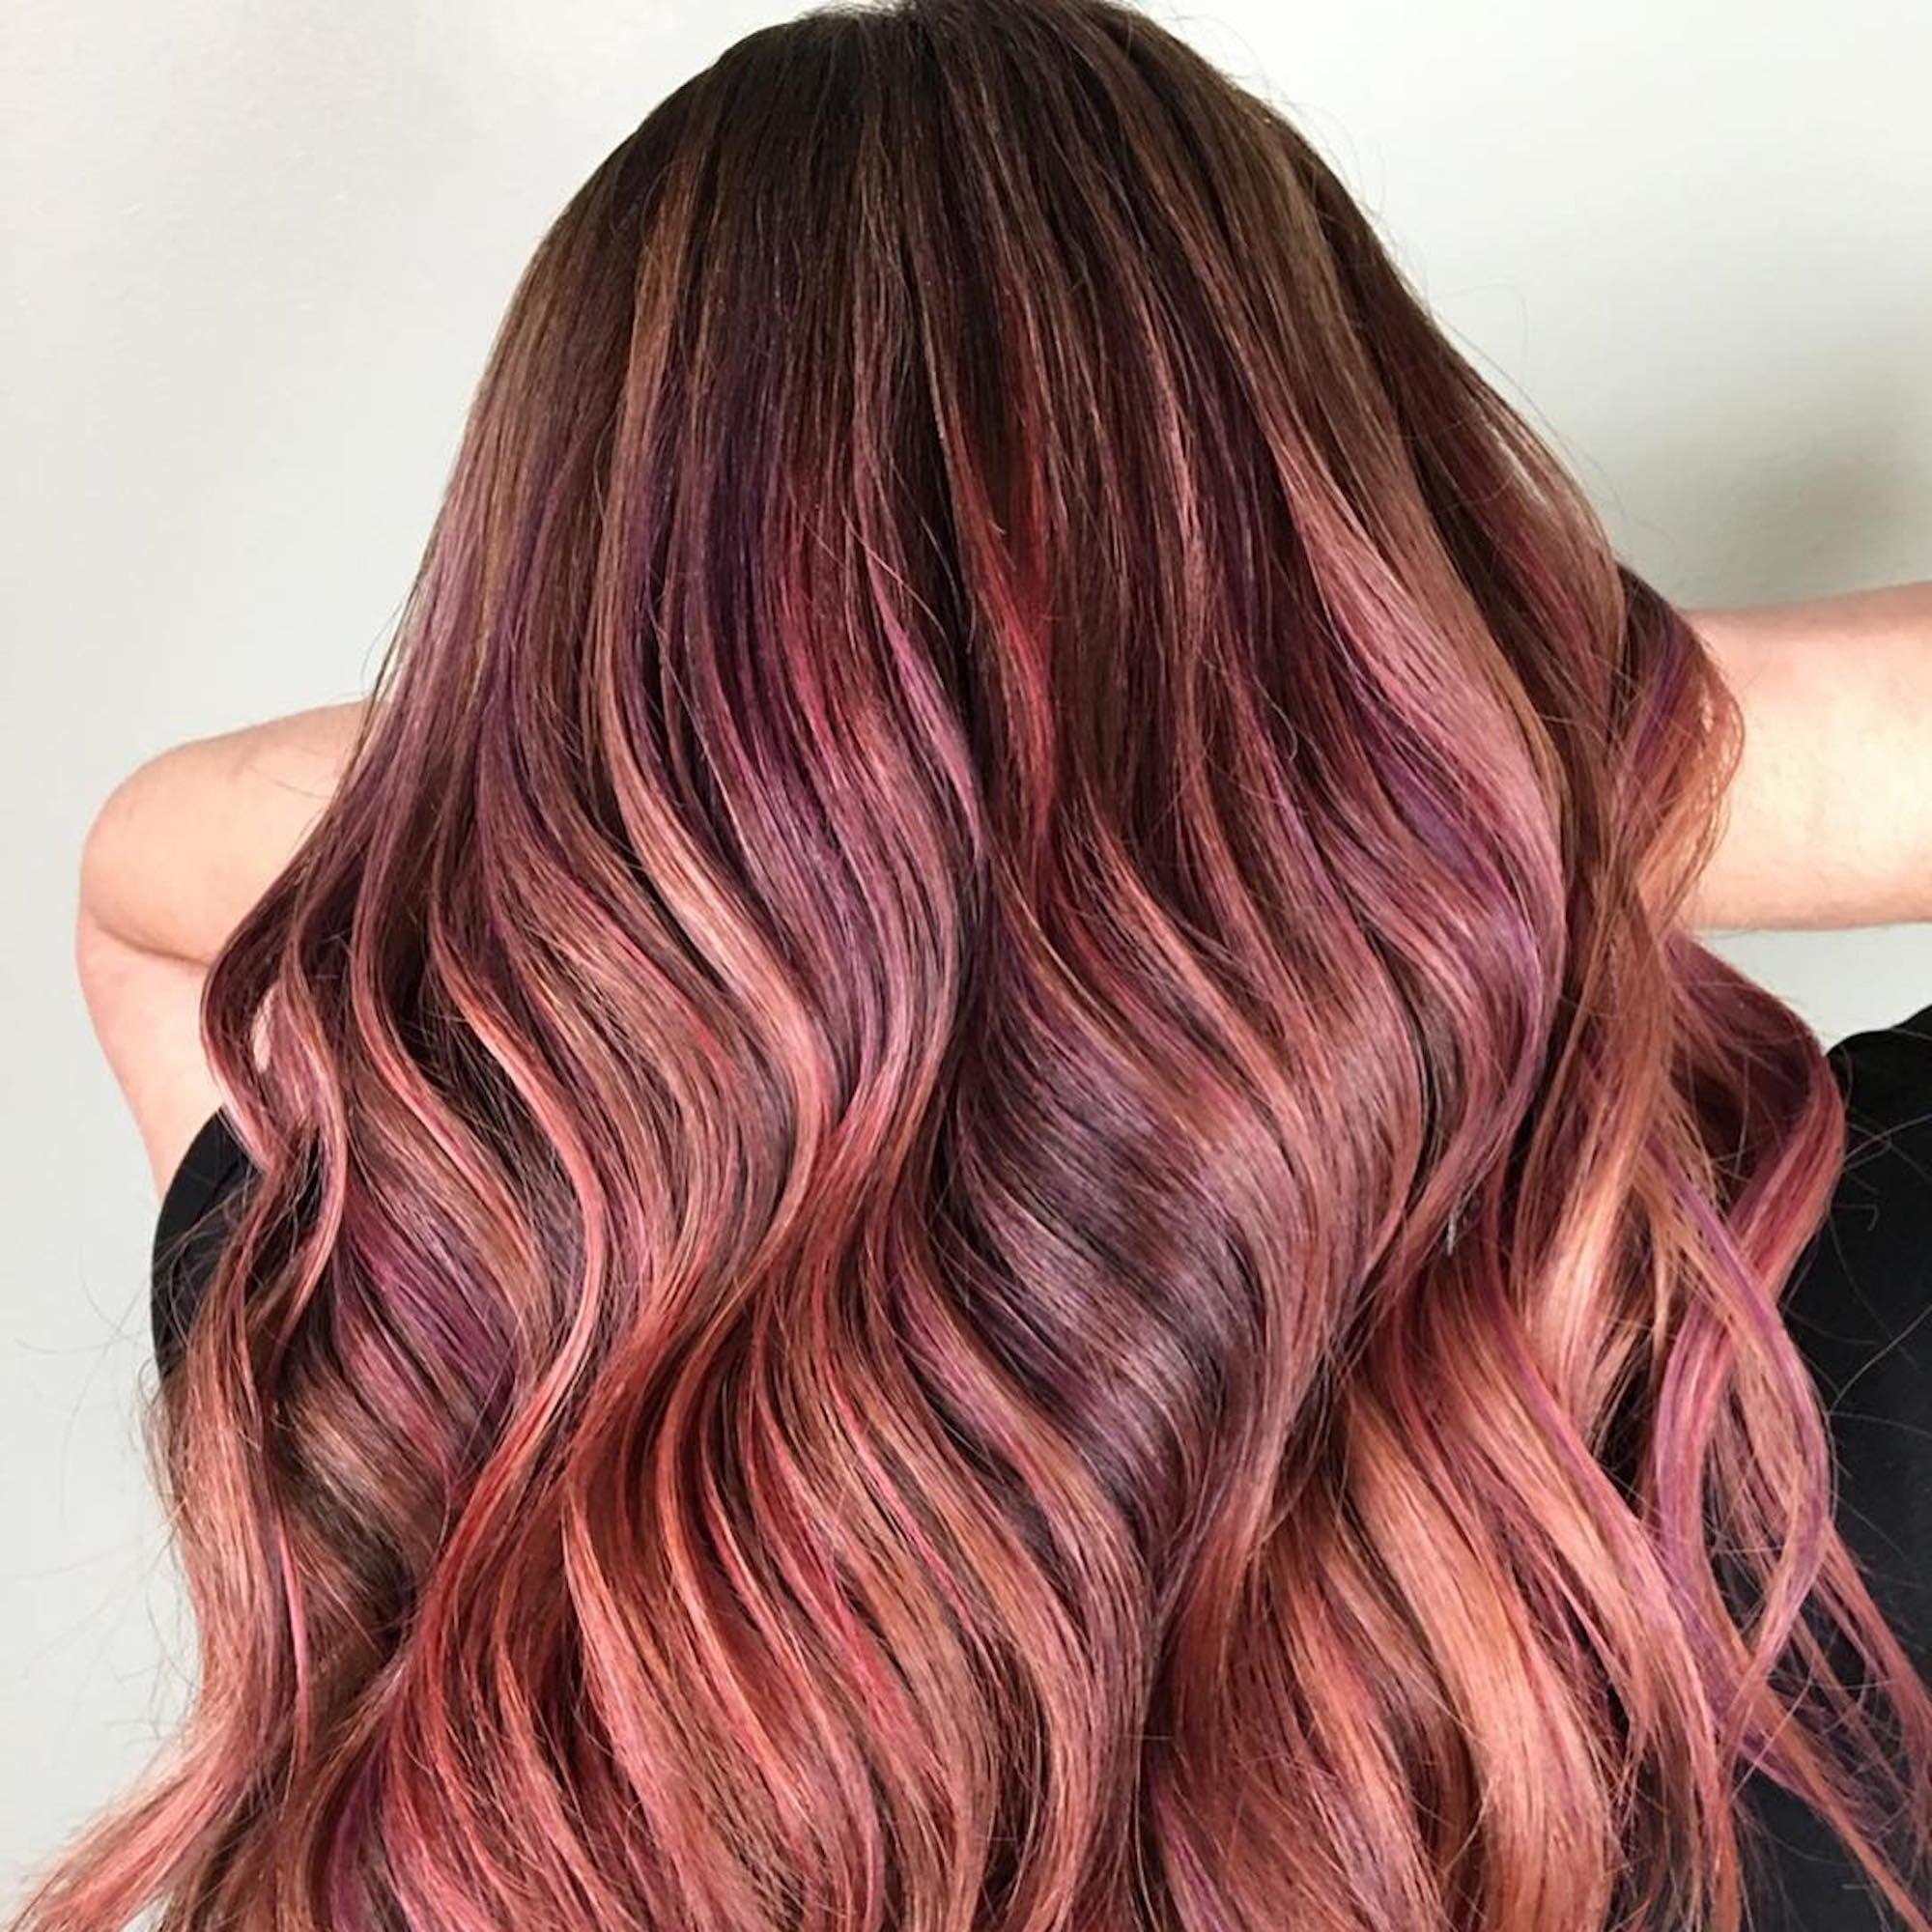 Fruit Juice Hair Color Trend | POPSUGAR Beauty